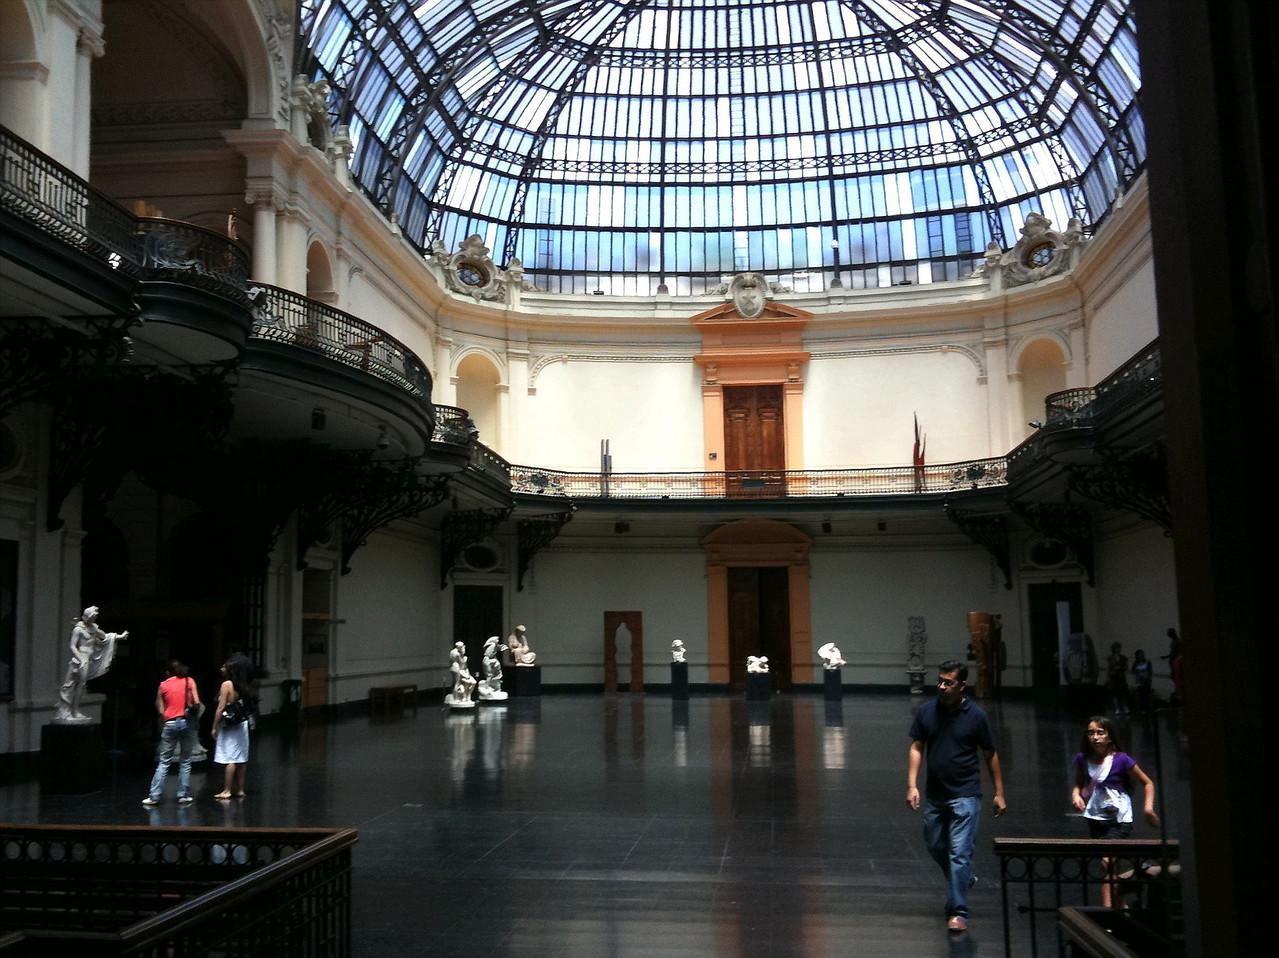 Belles Artes Museum